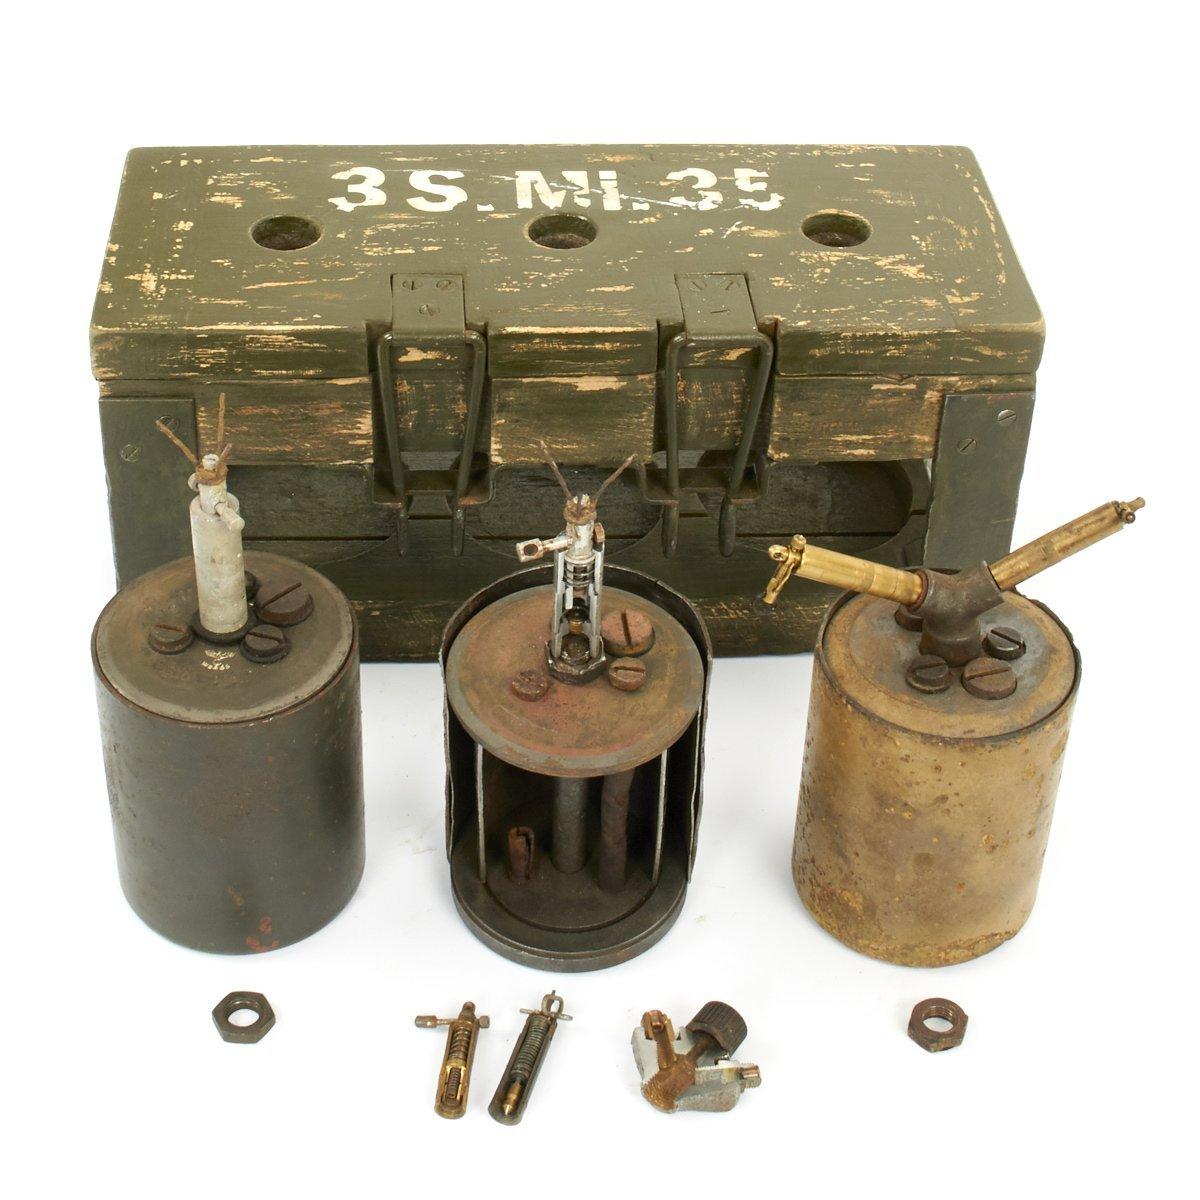 [DIAGRAM_38ZD]  VL_5166] Vintage Miners Fuse Box Free Diagram   Vintage Miners Fuse Box      Anal Diog Bocep Mohammedshrine Librar Wiring 101